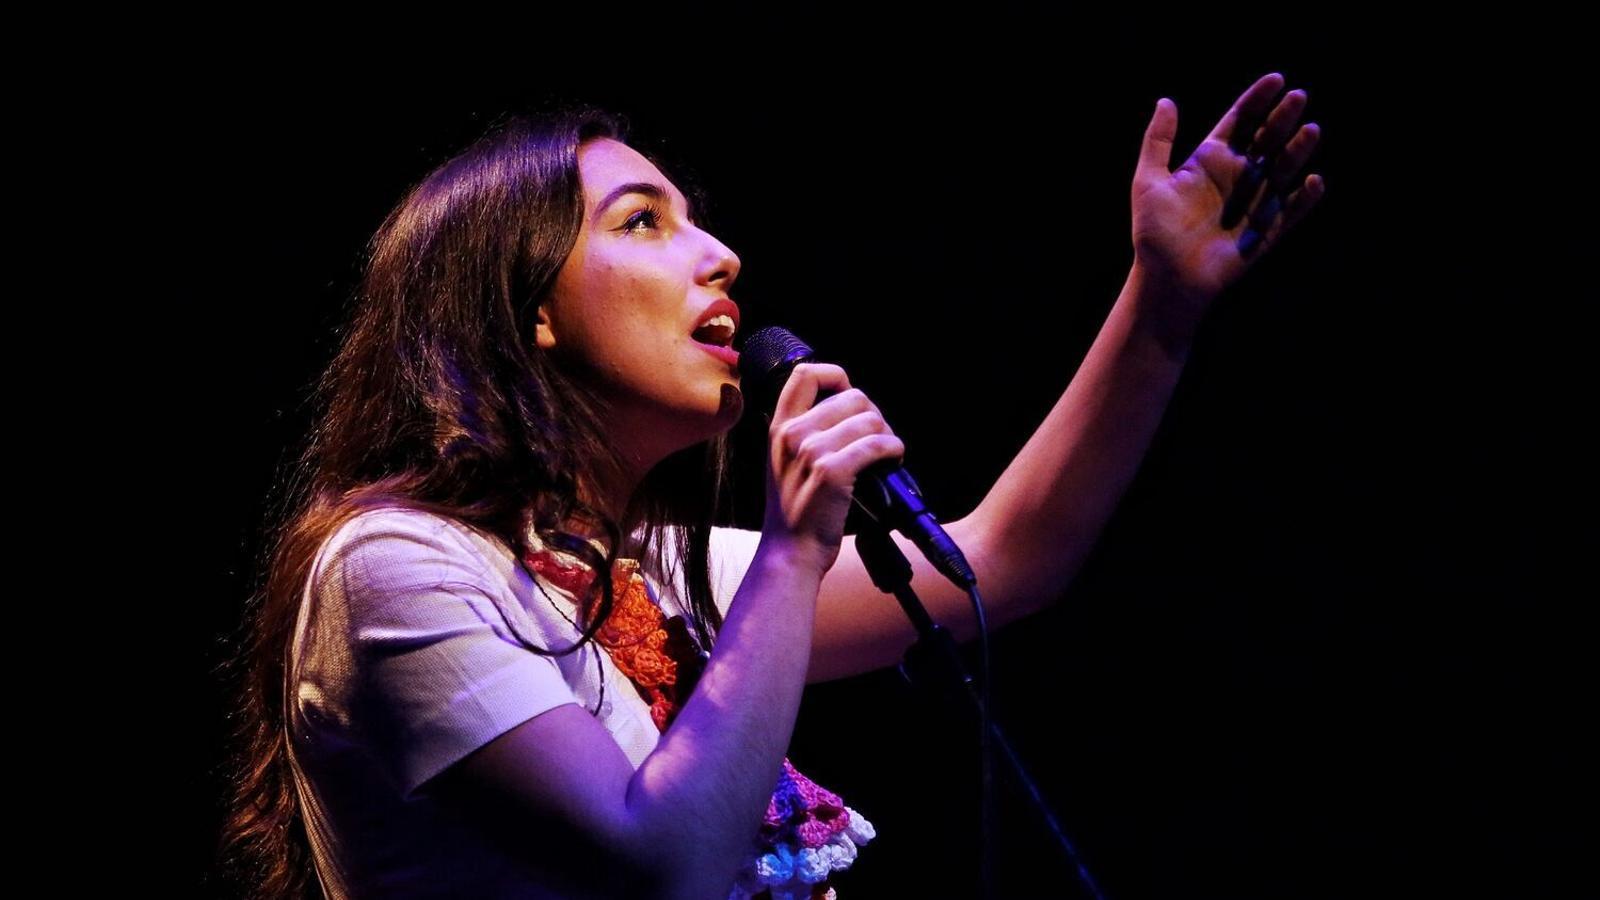 María José Llergo durant el concert a la sala 2 de L'Auditori de Barcelona / PERE VIRGILI